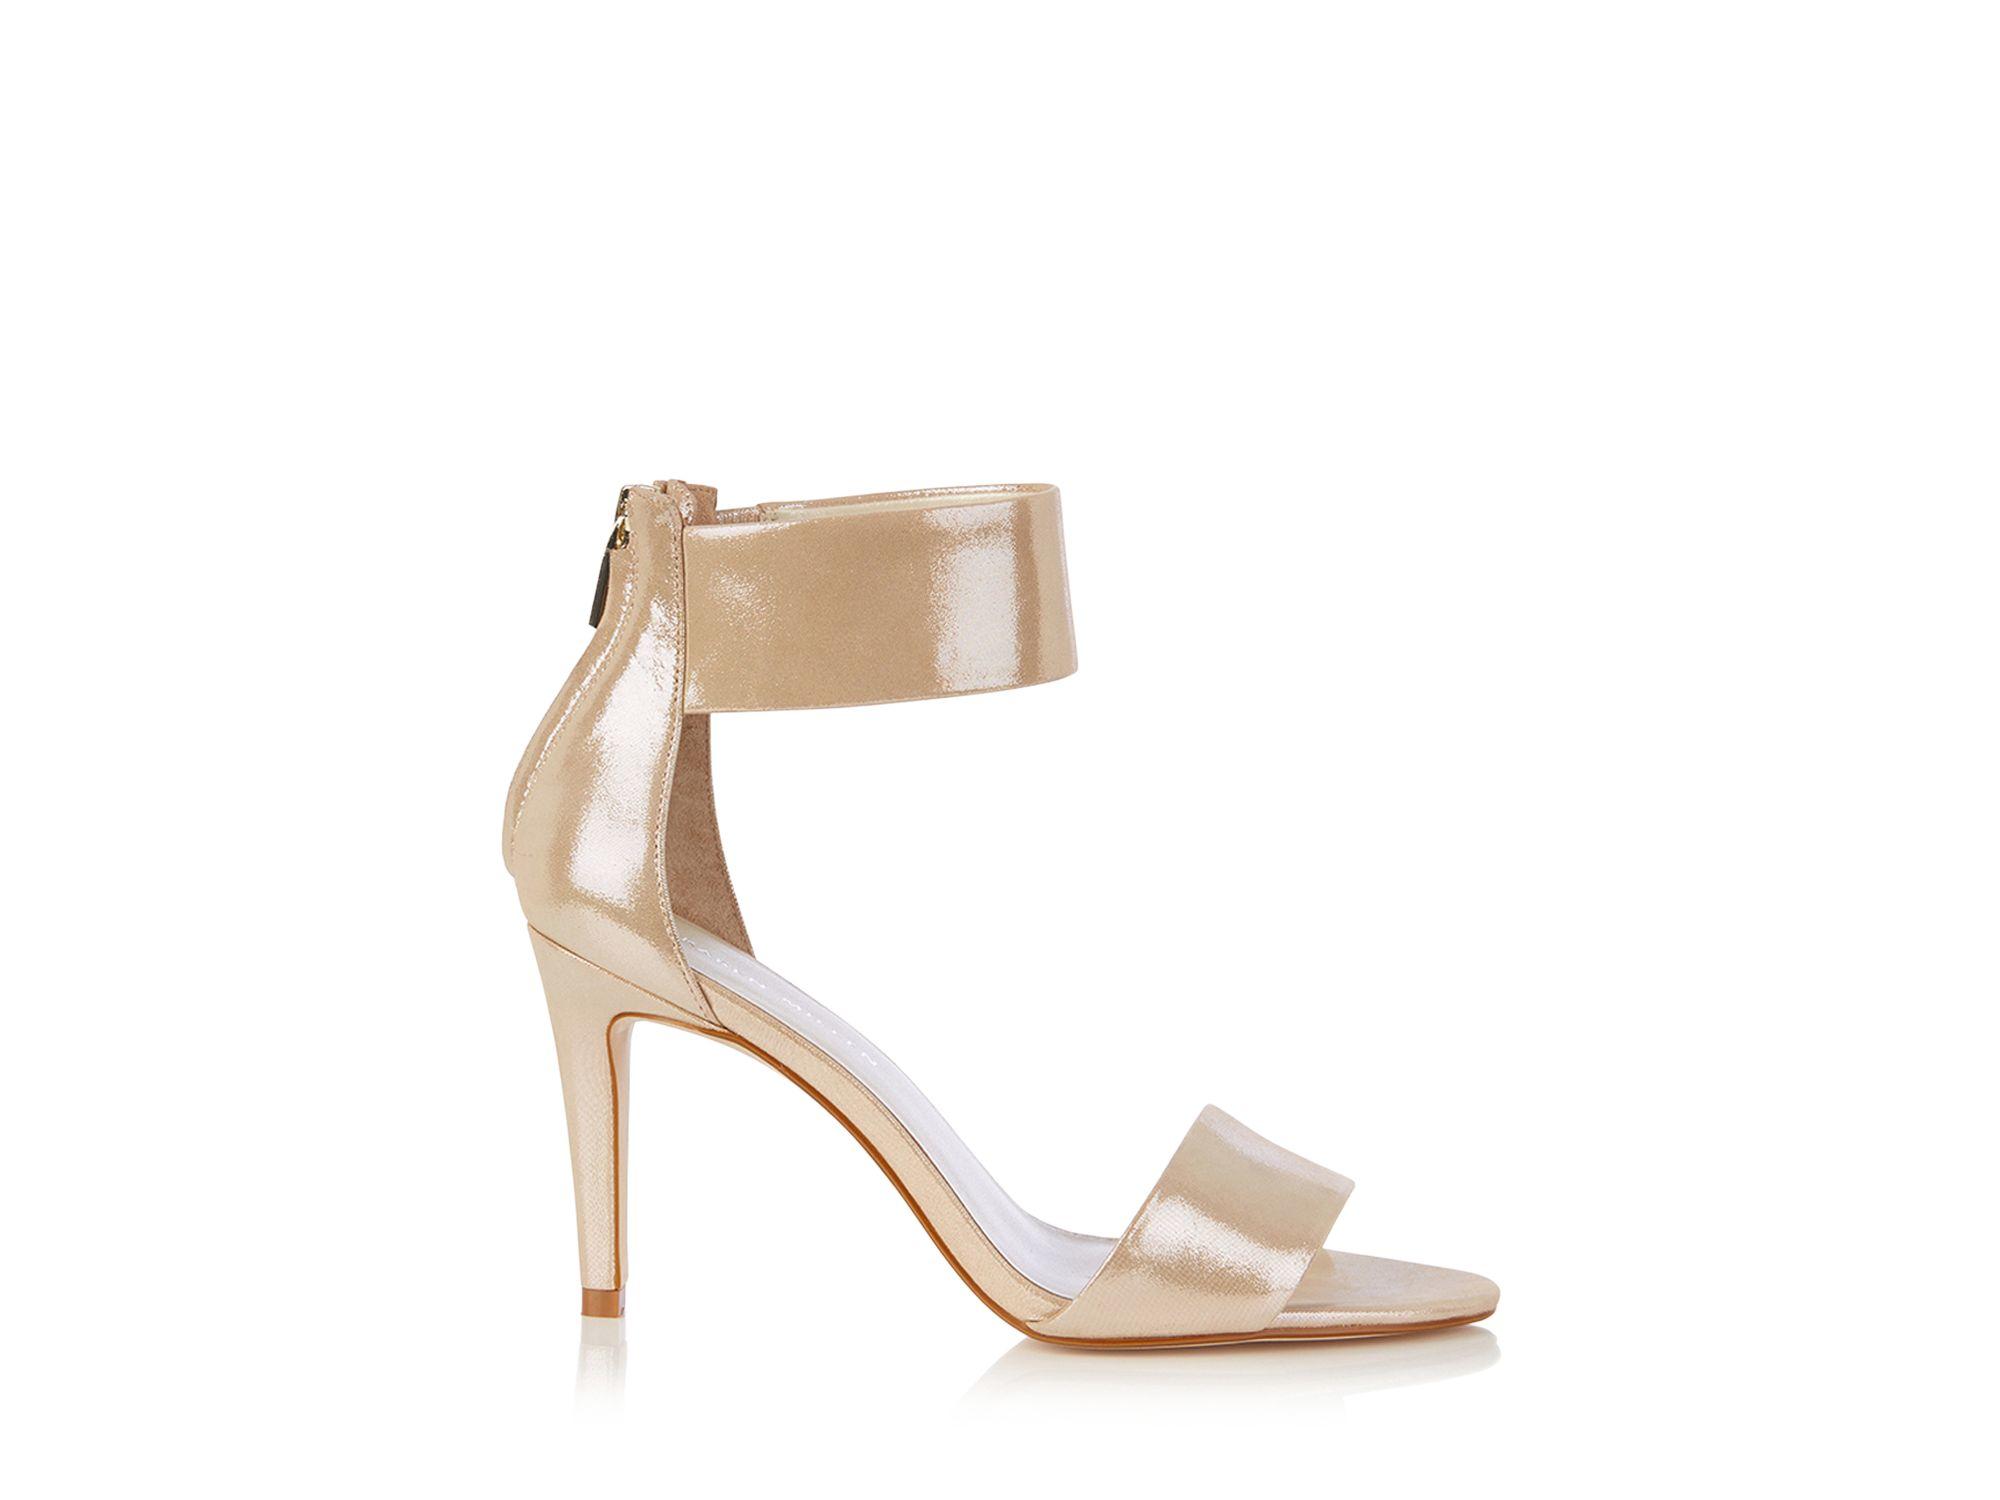 Karen Millen Women's Embellished Ankle Cuff High Heel Sandals XTe9h